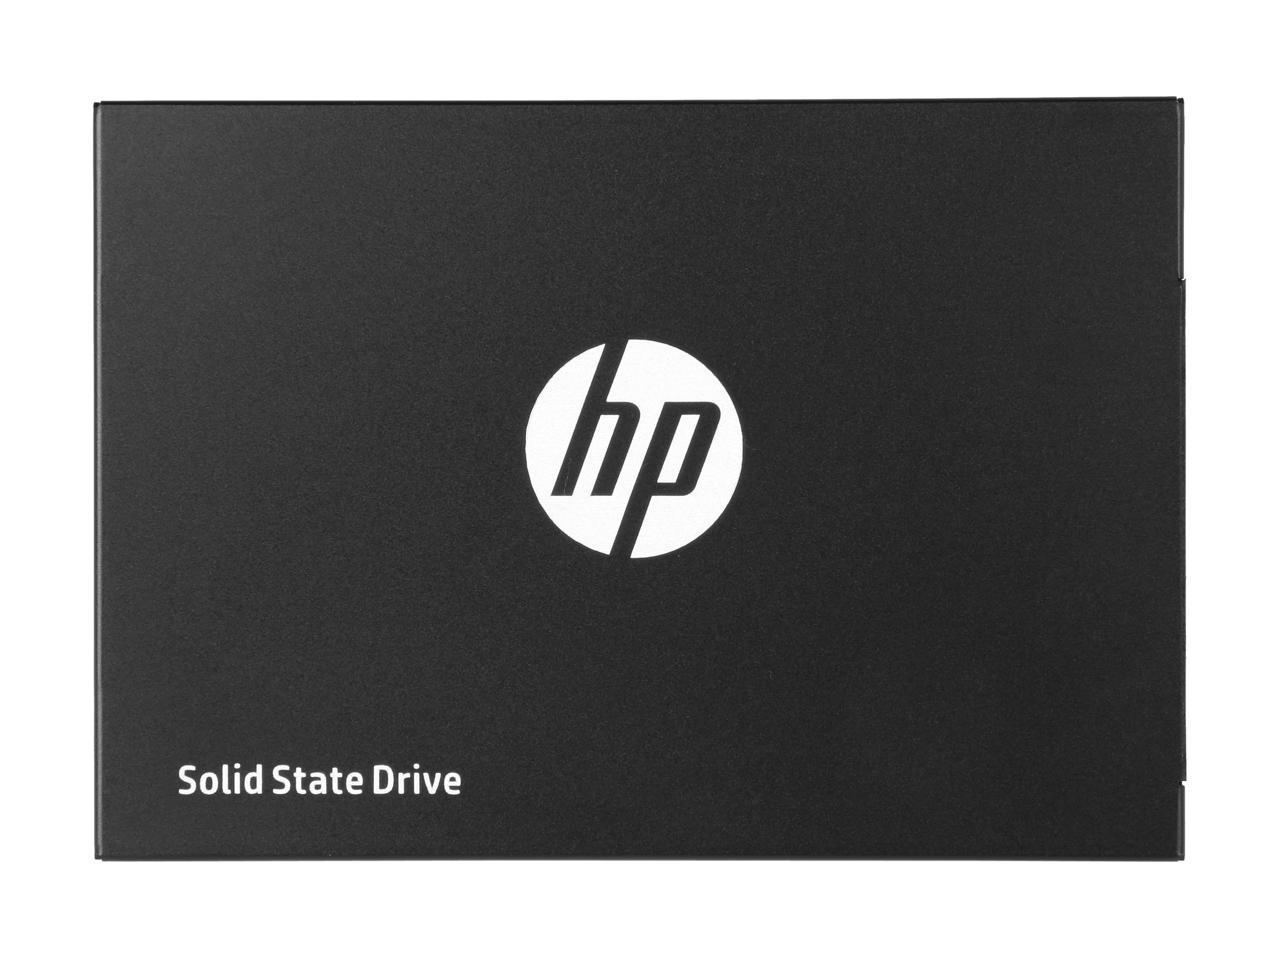 HP-S700-2-5-034-500GB-SATA-III-3D-NAND-Internal-Solid-State-Drive-SSD-2DP99AA-ABC thumbnail 2